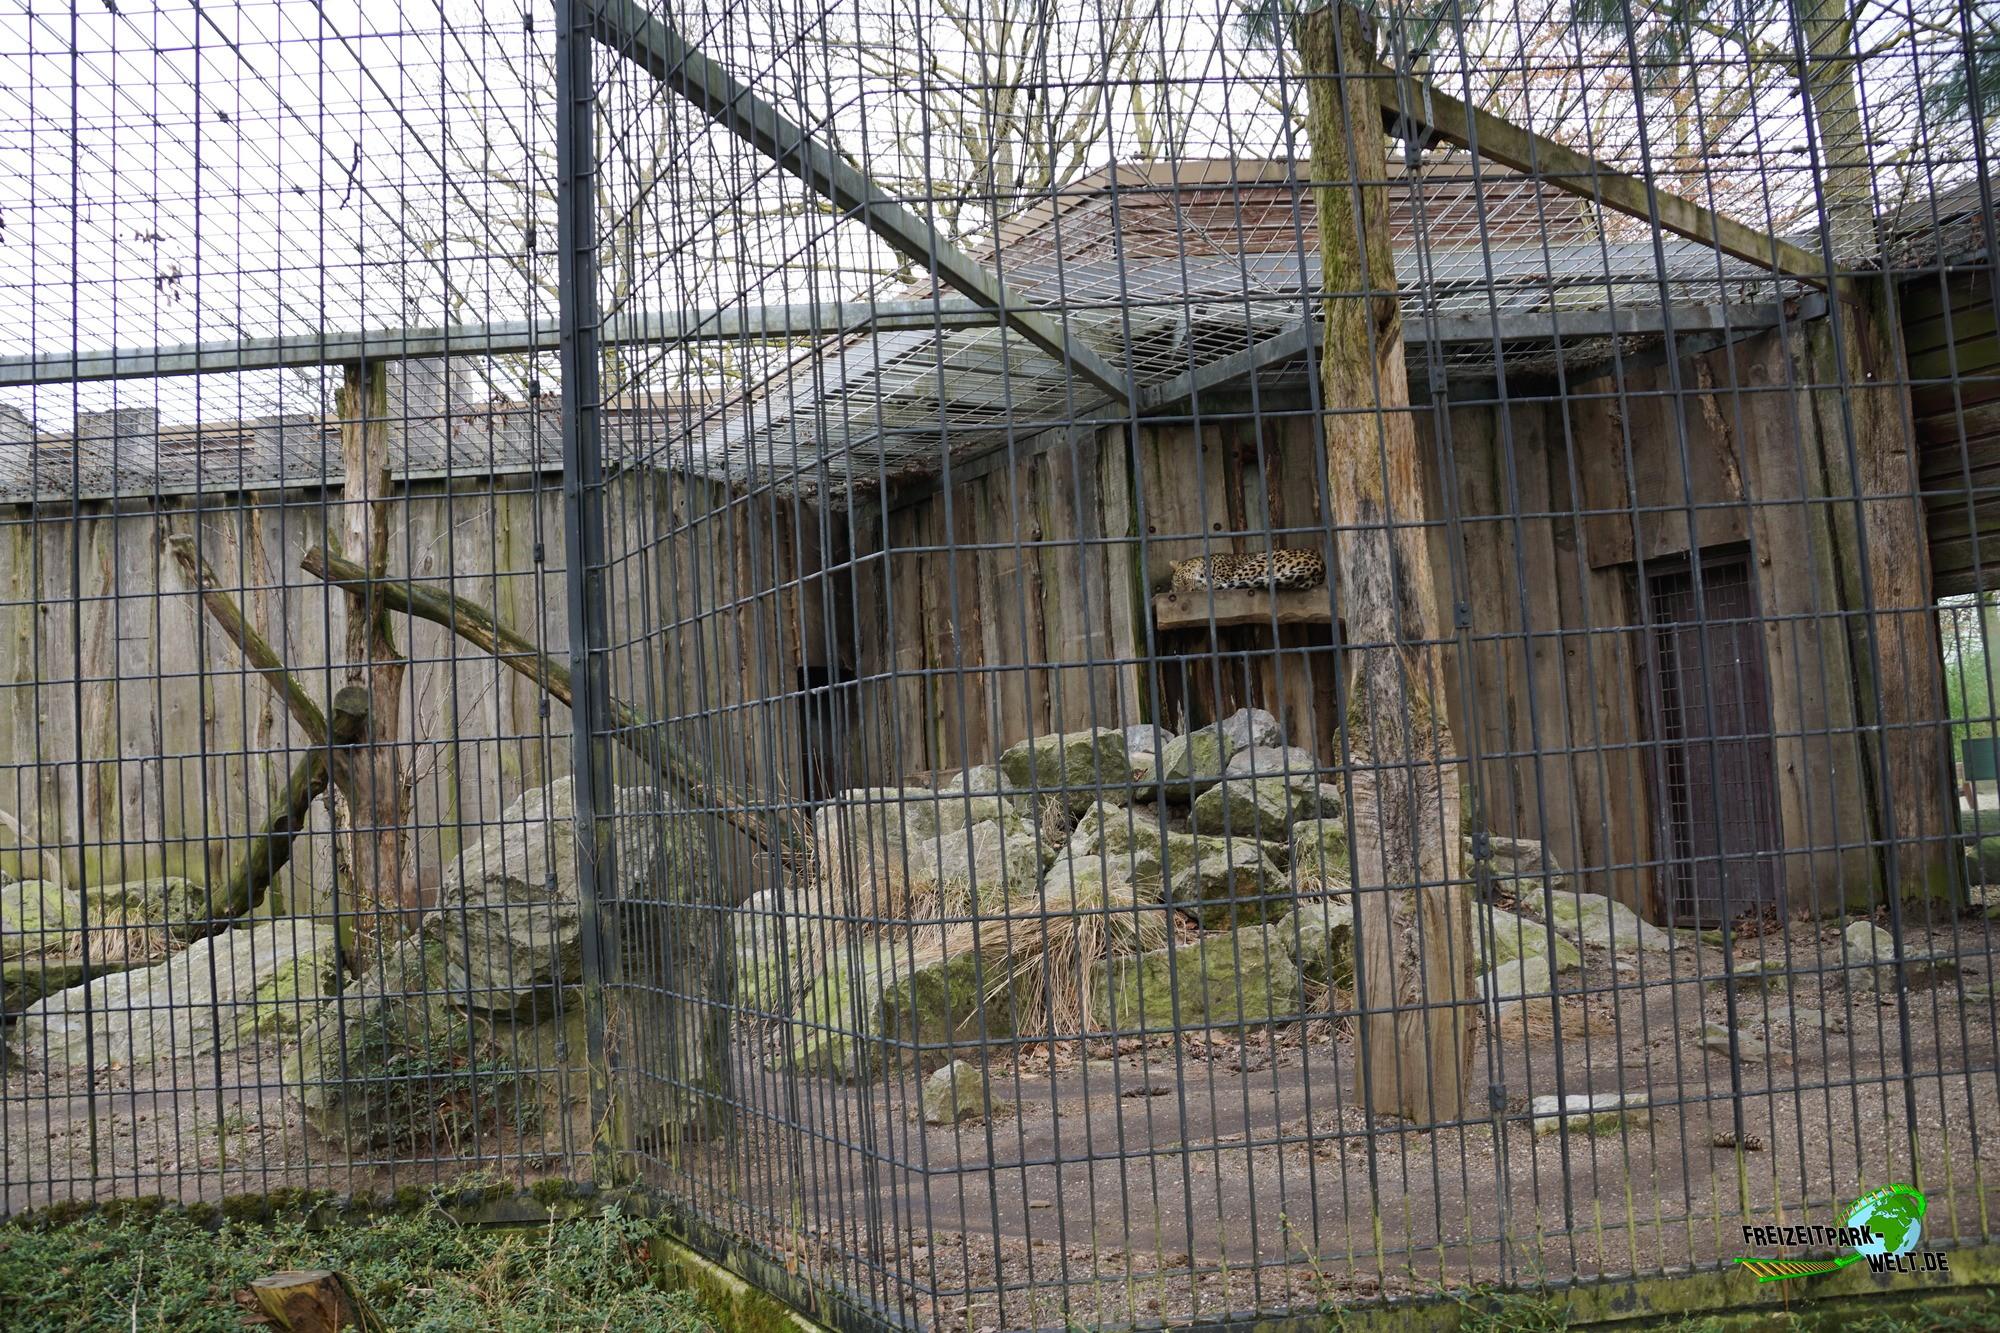 persischer leopard allwetterzoo m nster freizeitpark. Black Bedroom Furniture Sets. Home Design Ideas